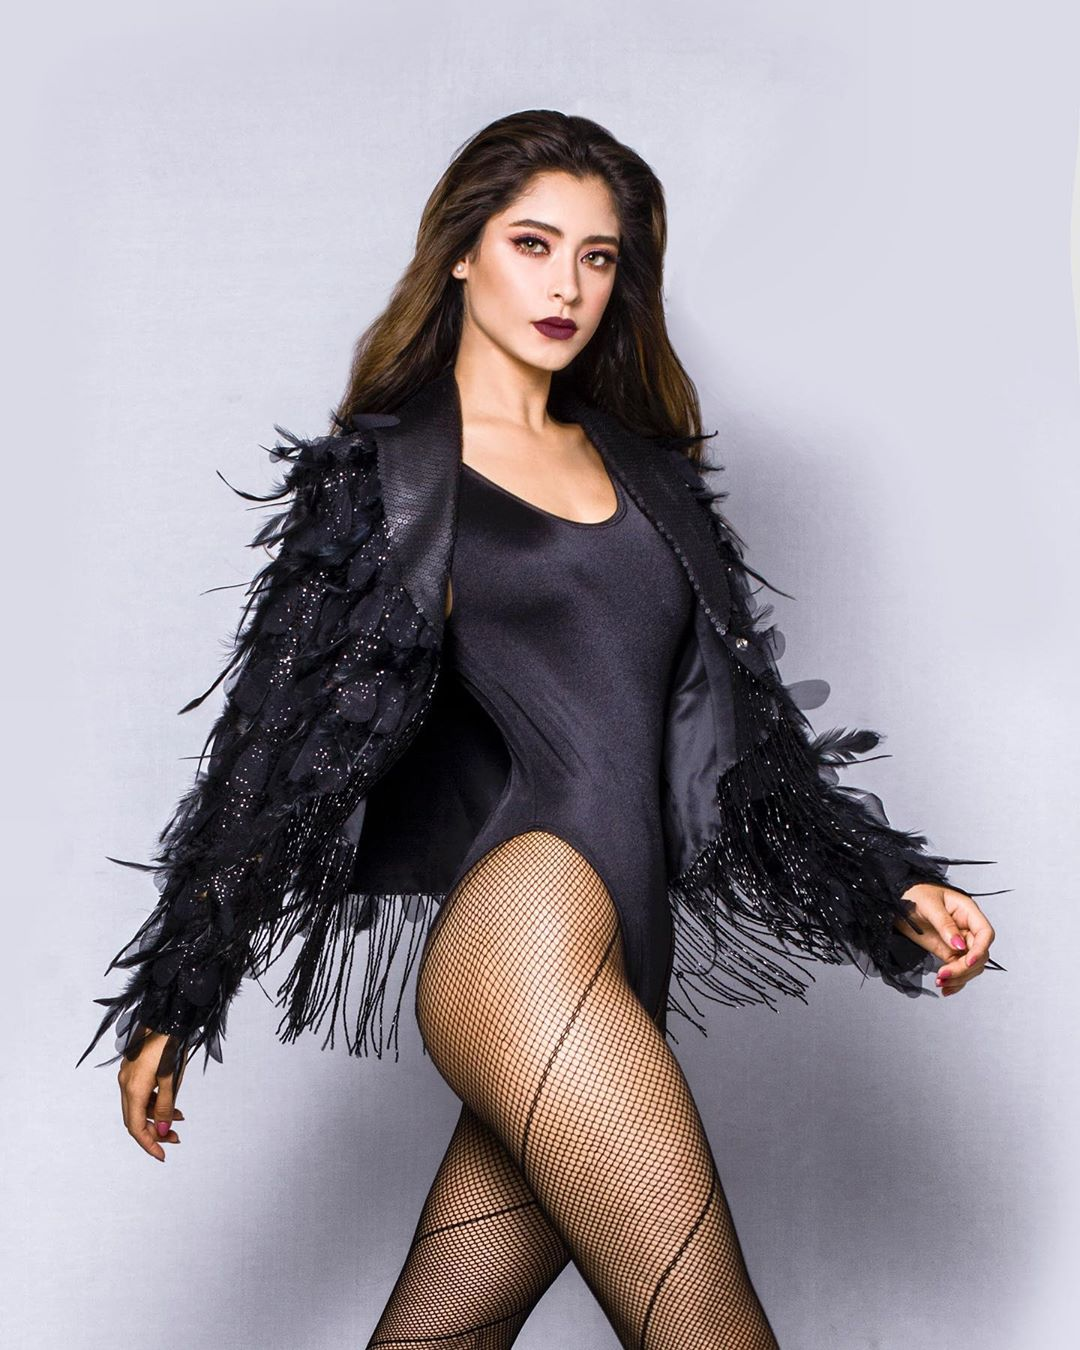 angela leon yuriar, top 21 de miss grand international 2020. - Página 3 66521310